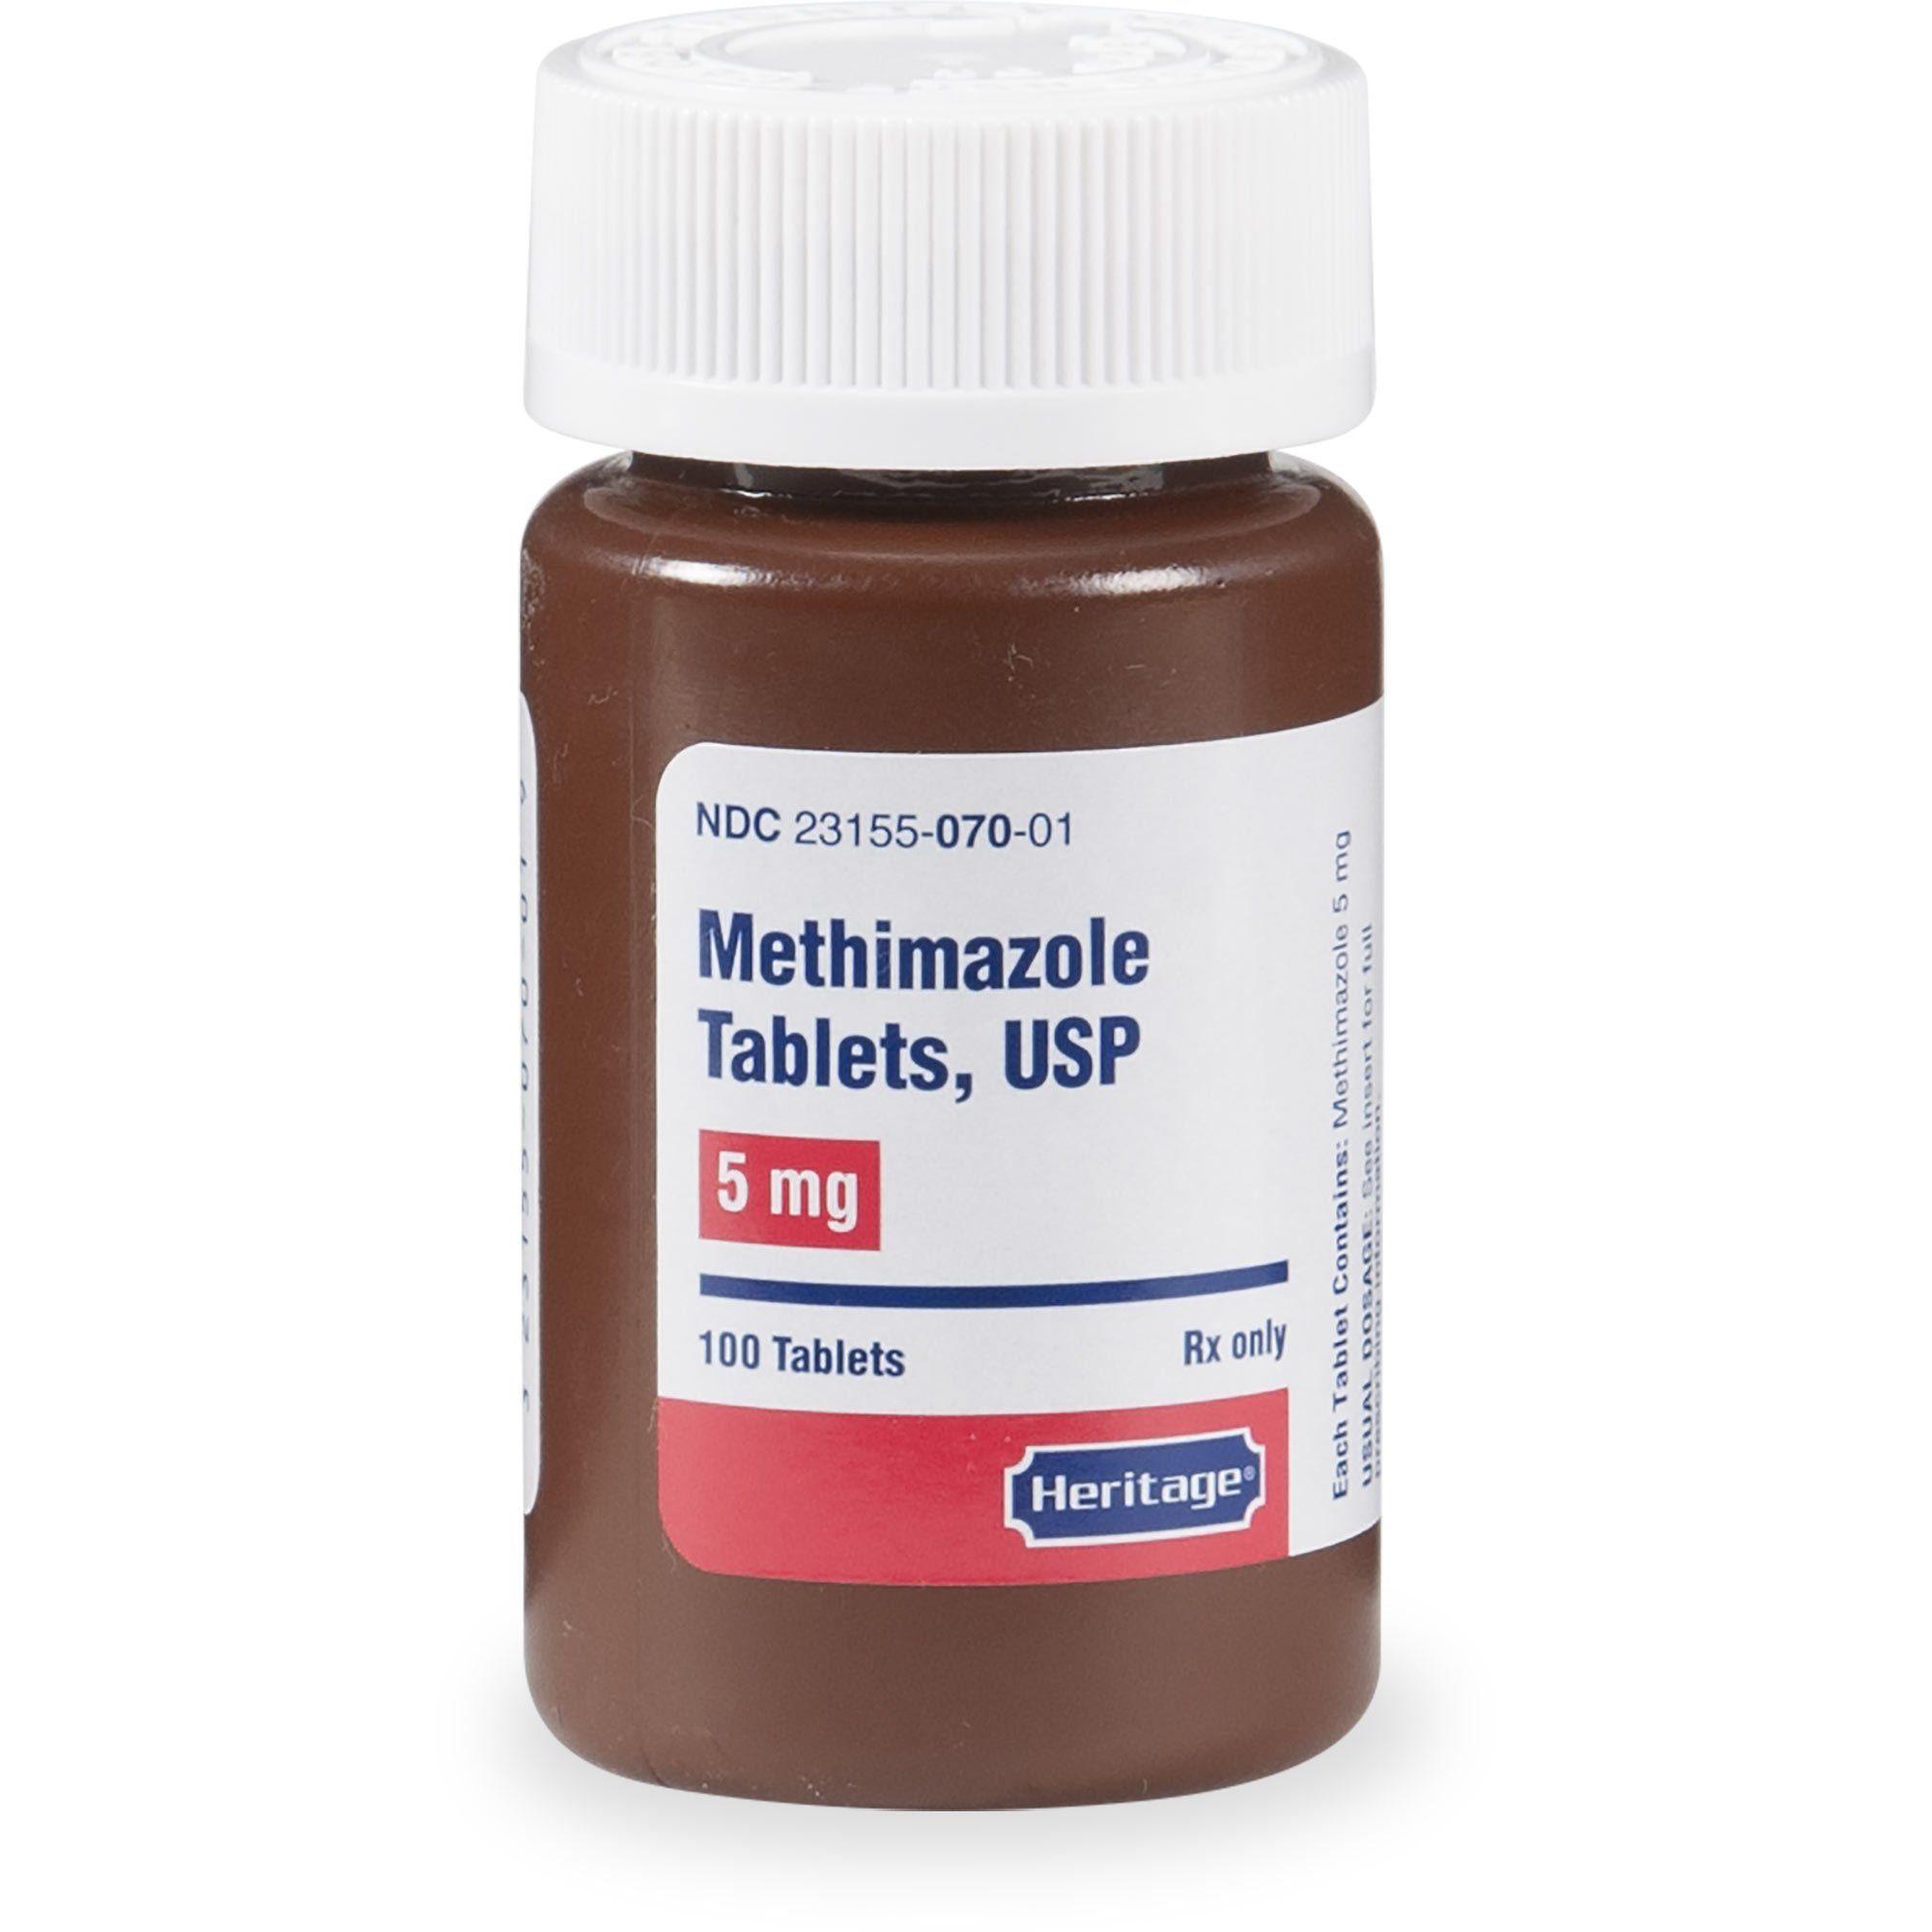 Methimazole 5 mg Tablets, 100 Count Wild bird food, The